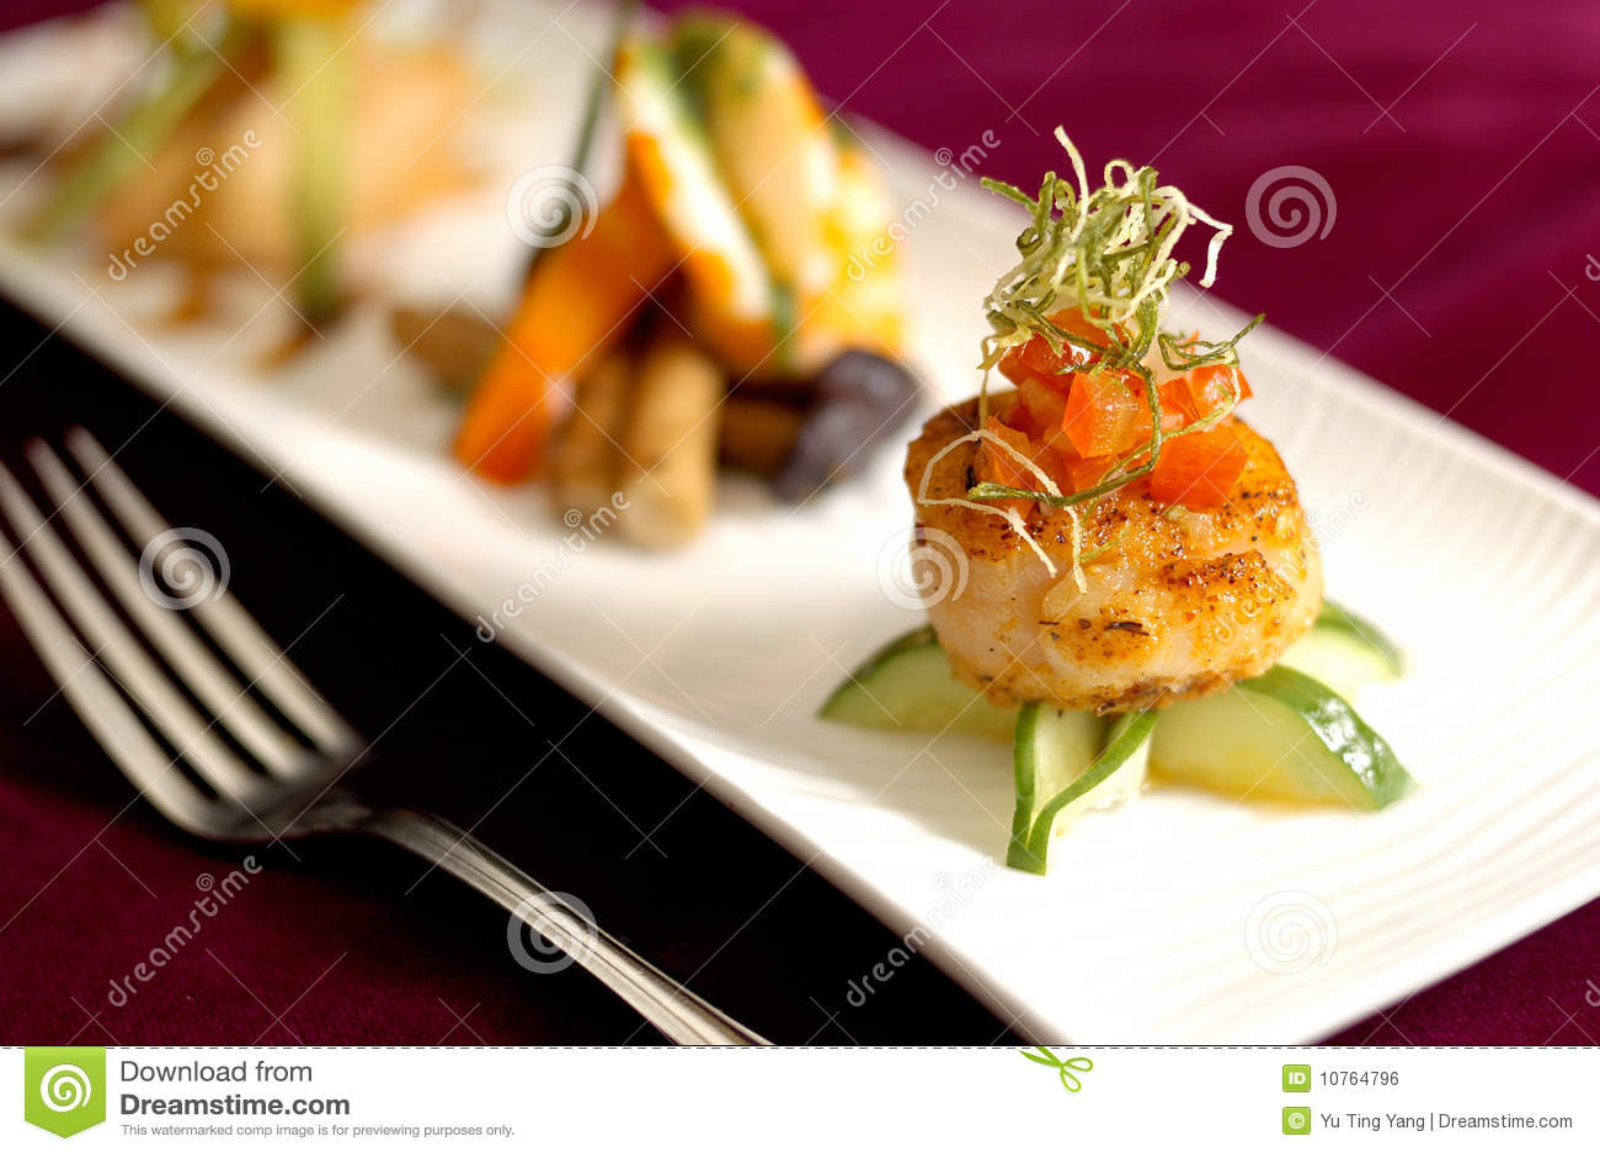 Creative Cuisine Appetizer Scallops Seafood Stock Photo